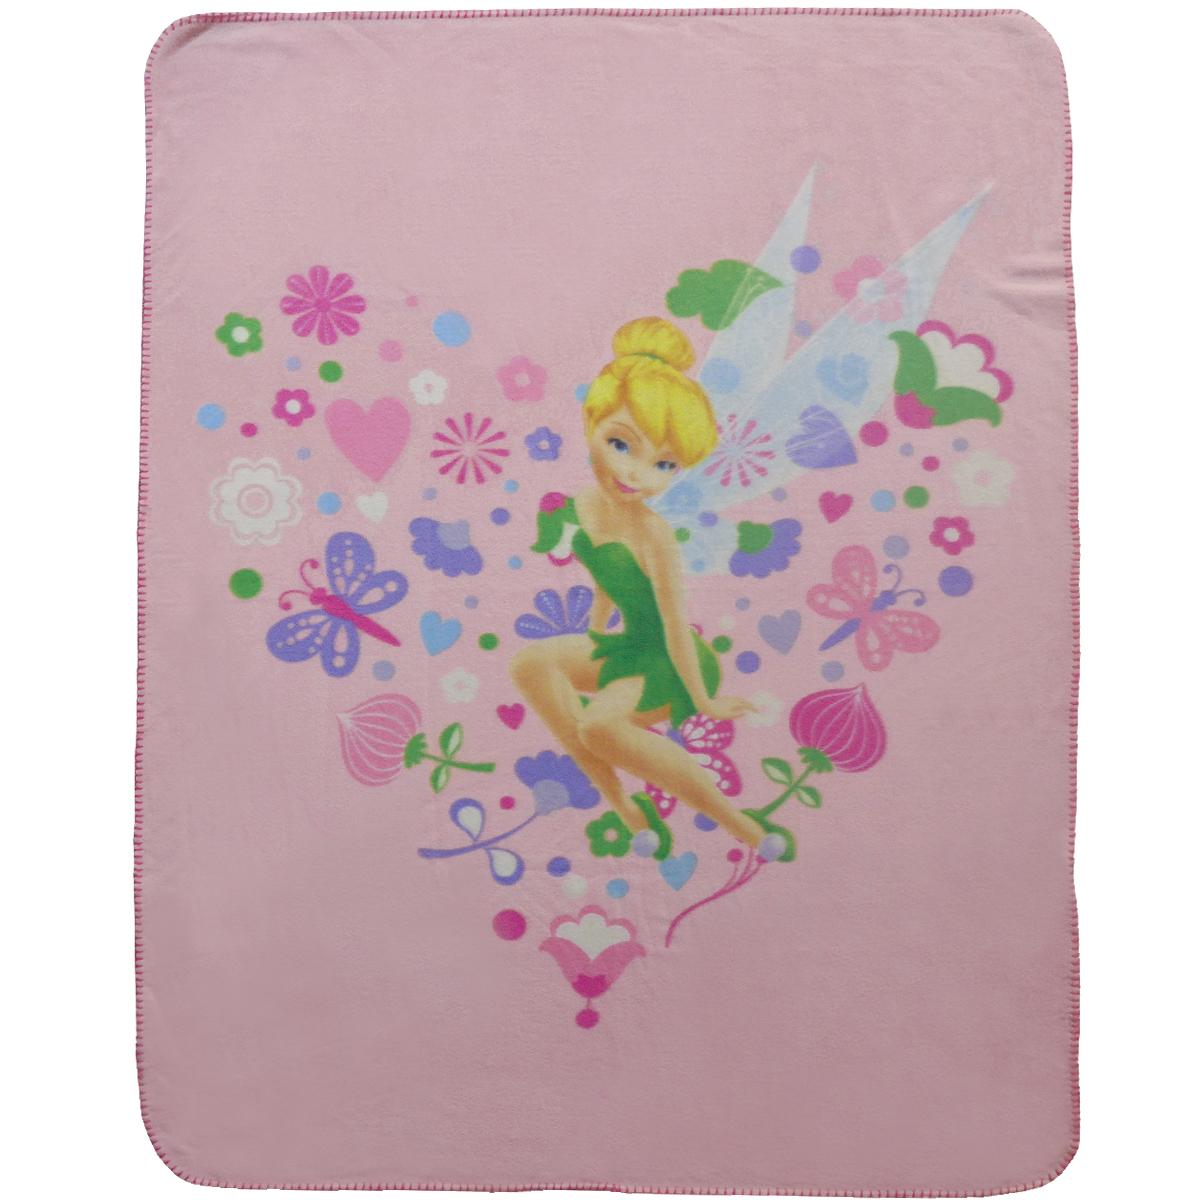 Dětská fleecová deka DISNEY FAIRIES SPRINGTIME 110x140 cm